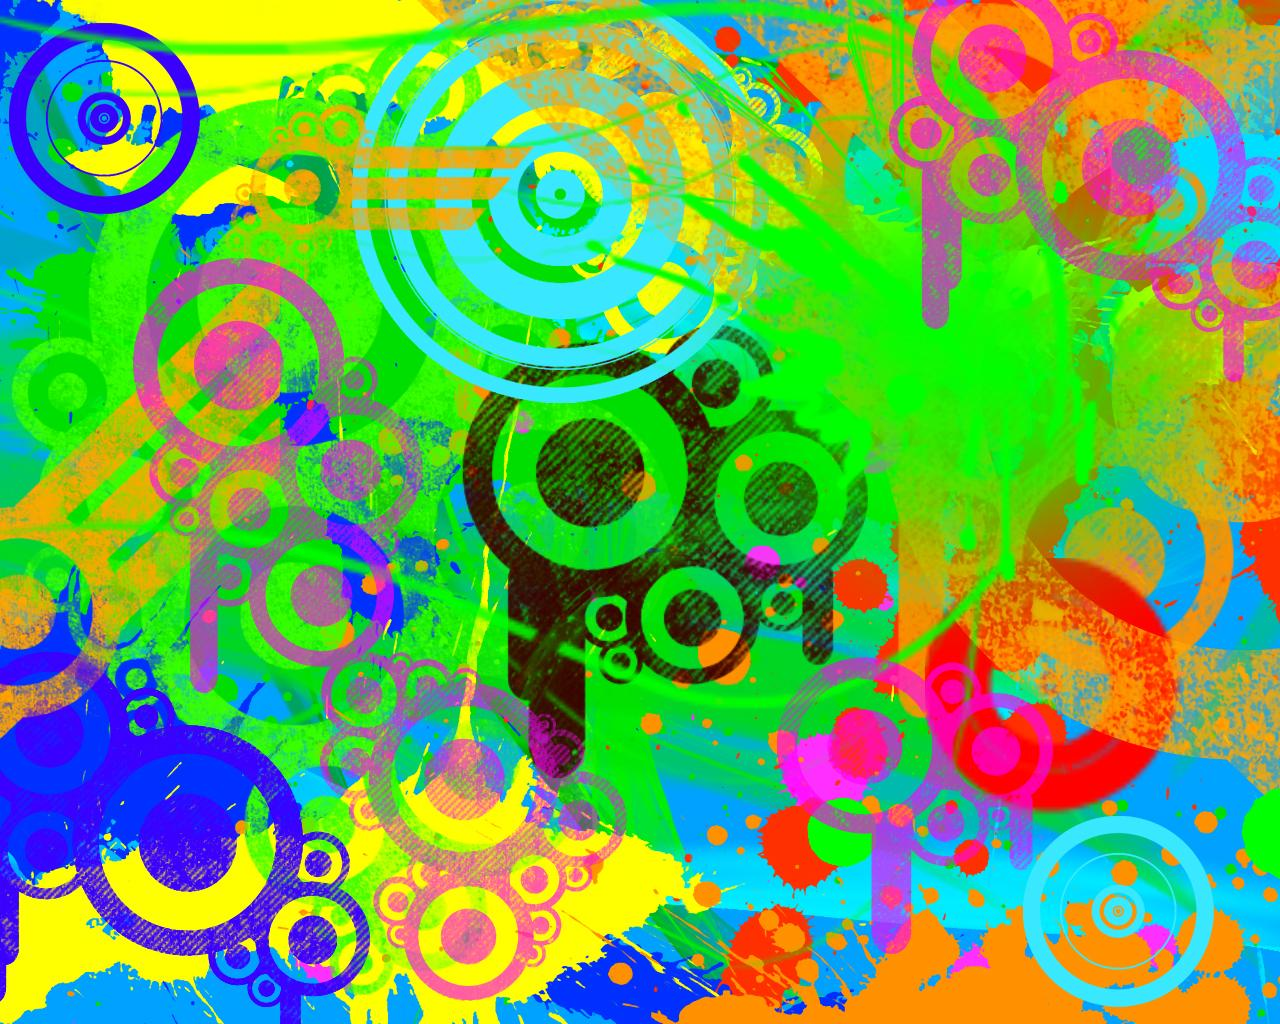 http://3.bp.blogspot.com/-7Lw3SXDvAy8/Ta9NDVm4jNI/AAAAAAAAHak/_O1AcMEC-jI/s1600/Funky%2BRetro.jpg